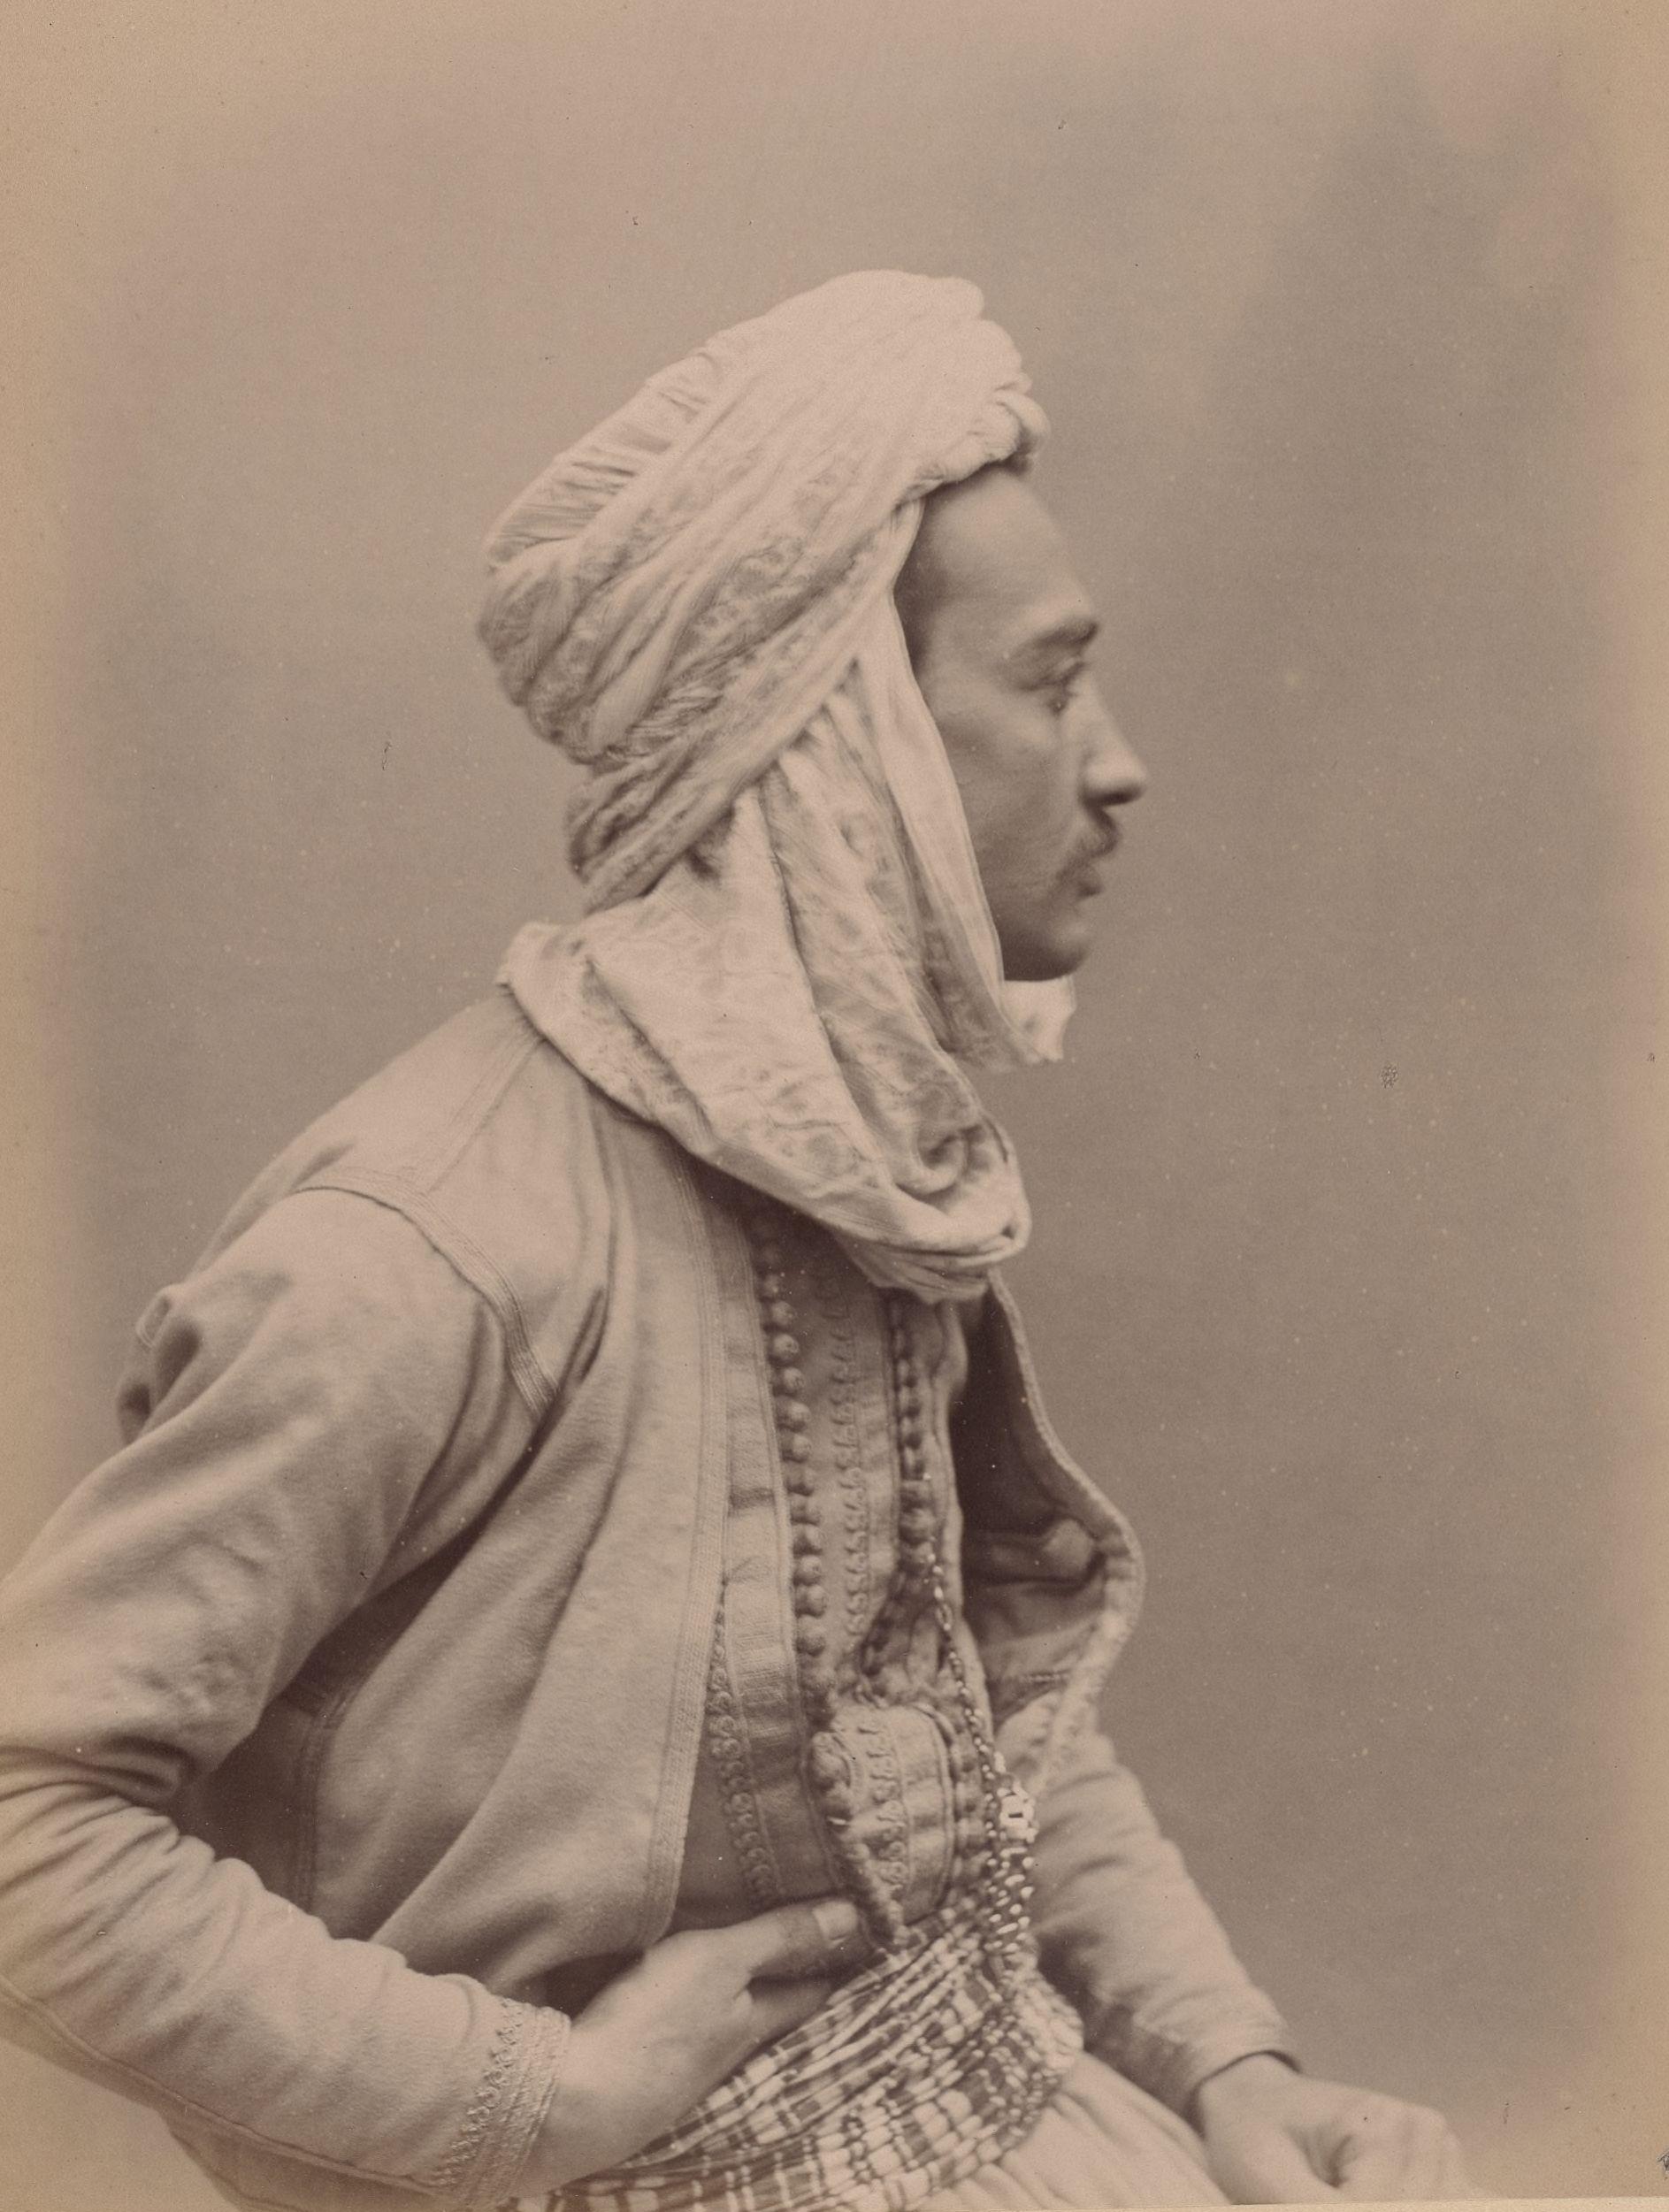 Лунис Аббебрахэм 28 лет,  музыкант (вид сбоку)